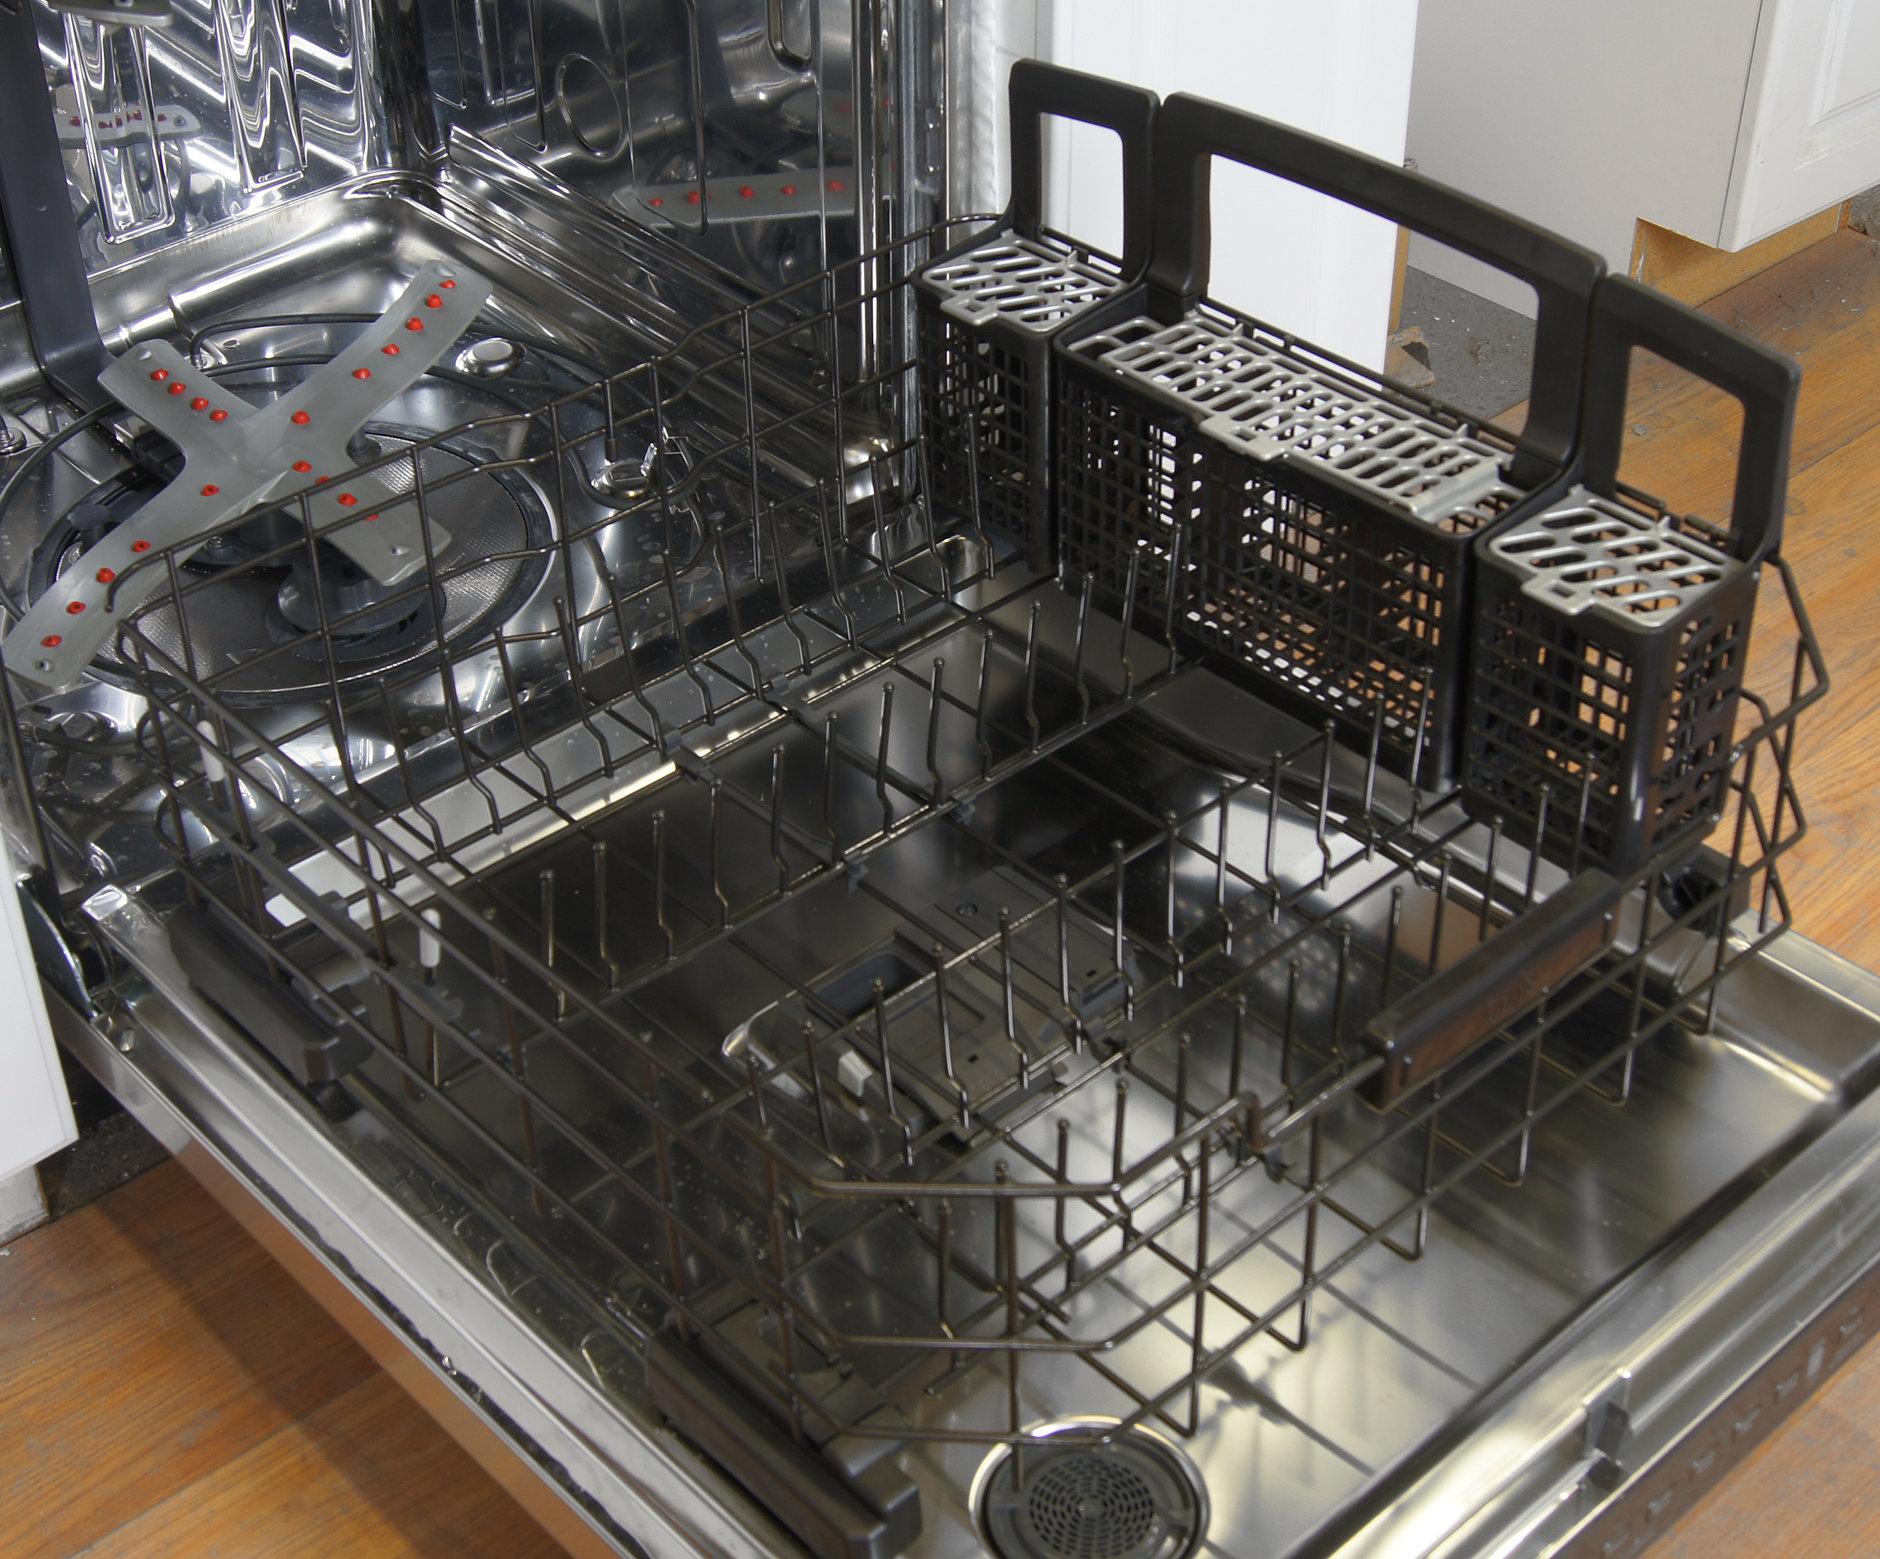 GE Cafe CDT725SSFSS bottom rack